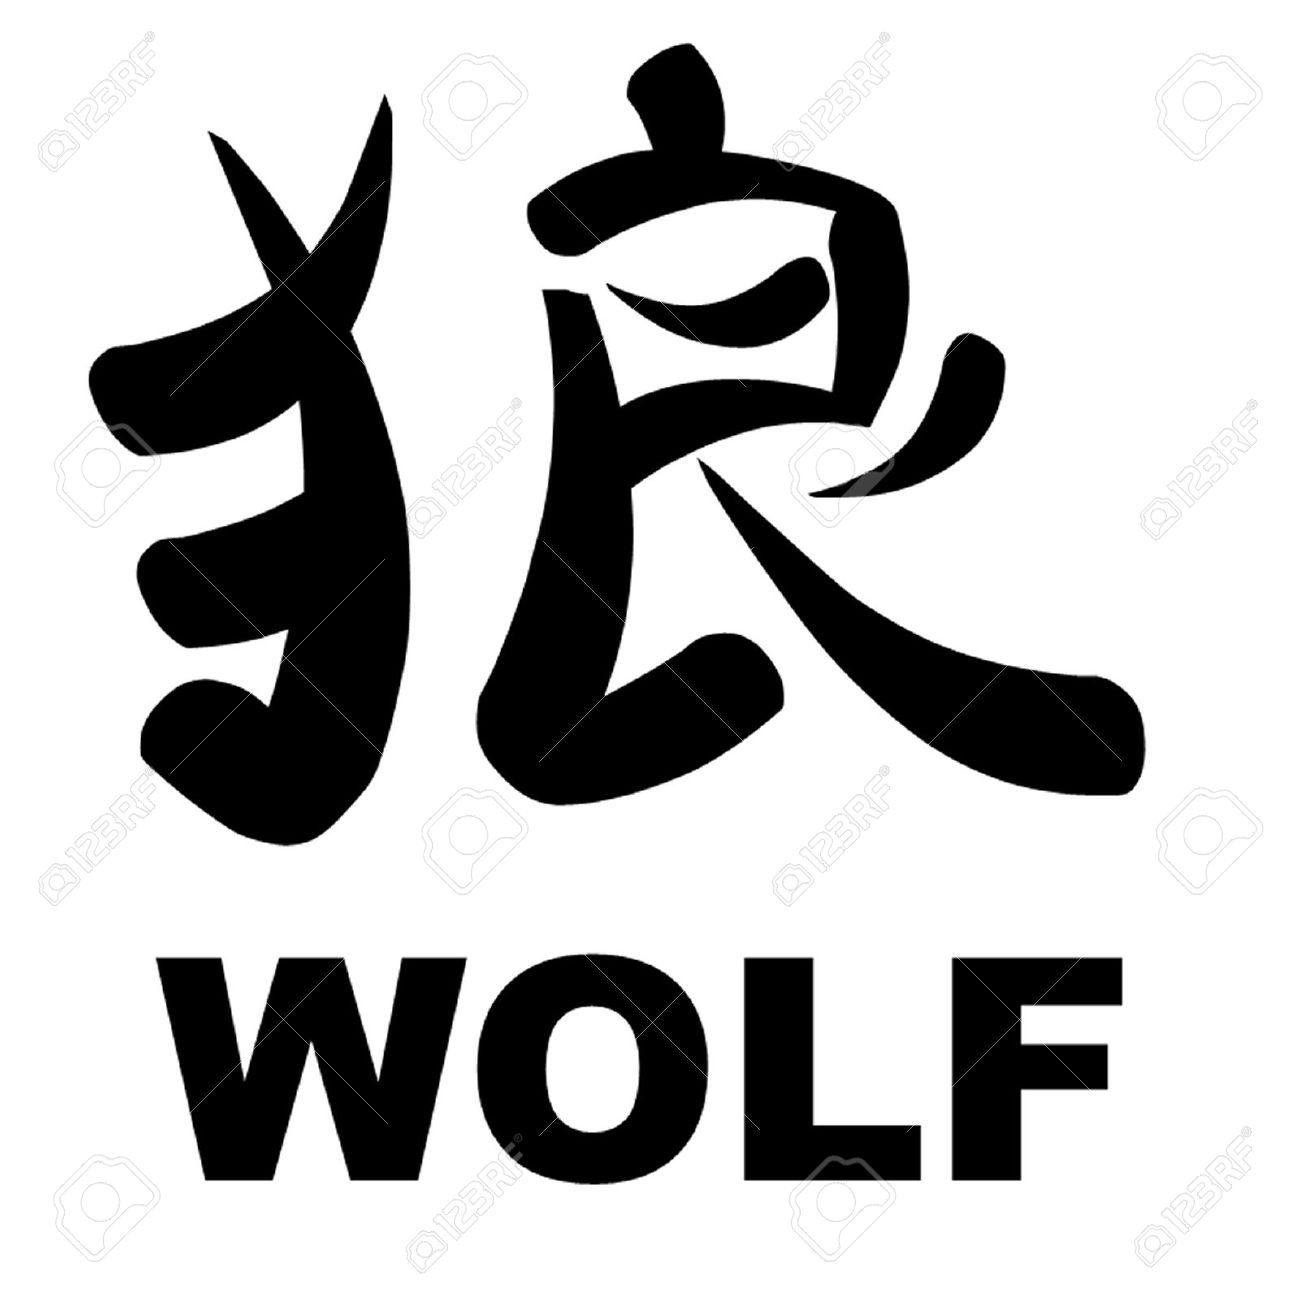 Japanese symbol for lone wolf images symbol and sign ideas wolf kanji japanese symbols view symbol buycottarizona biocorpaavc